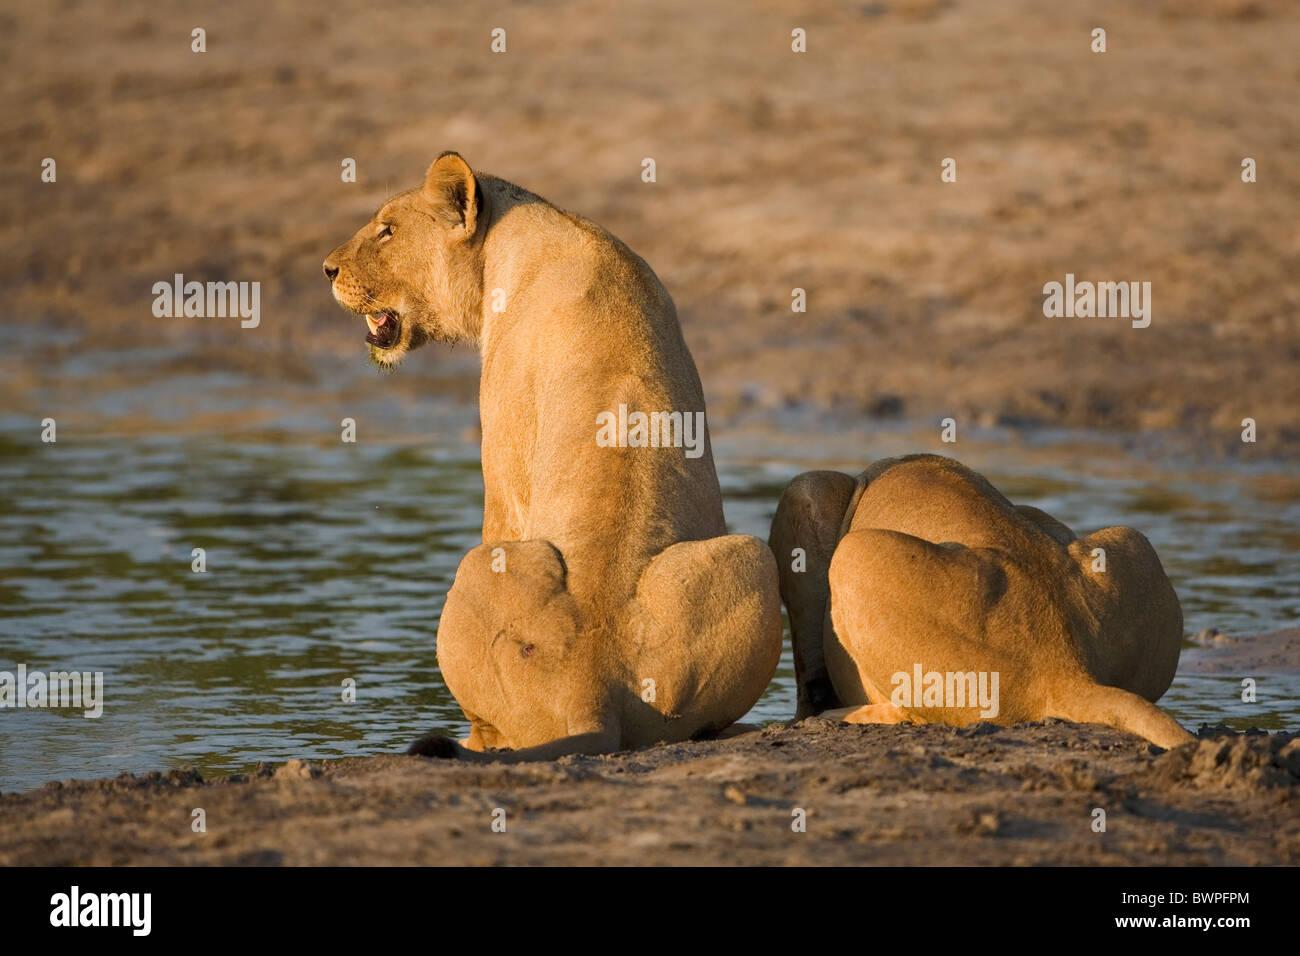 Loewe lion Panthera leo Stock Photo